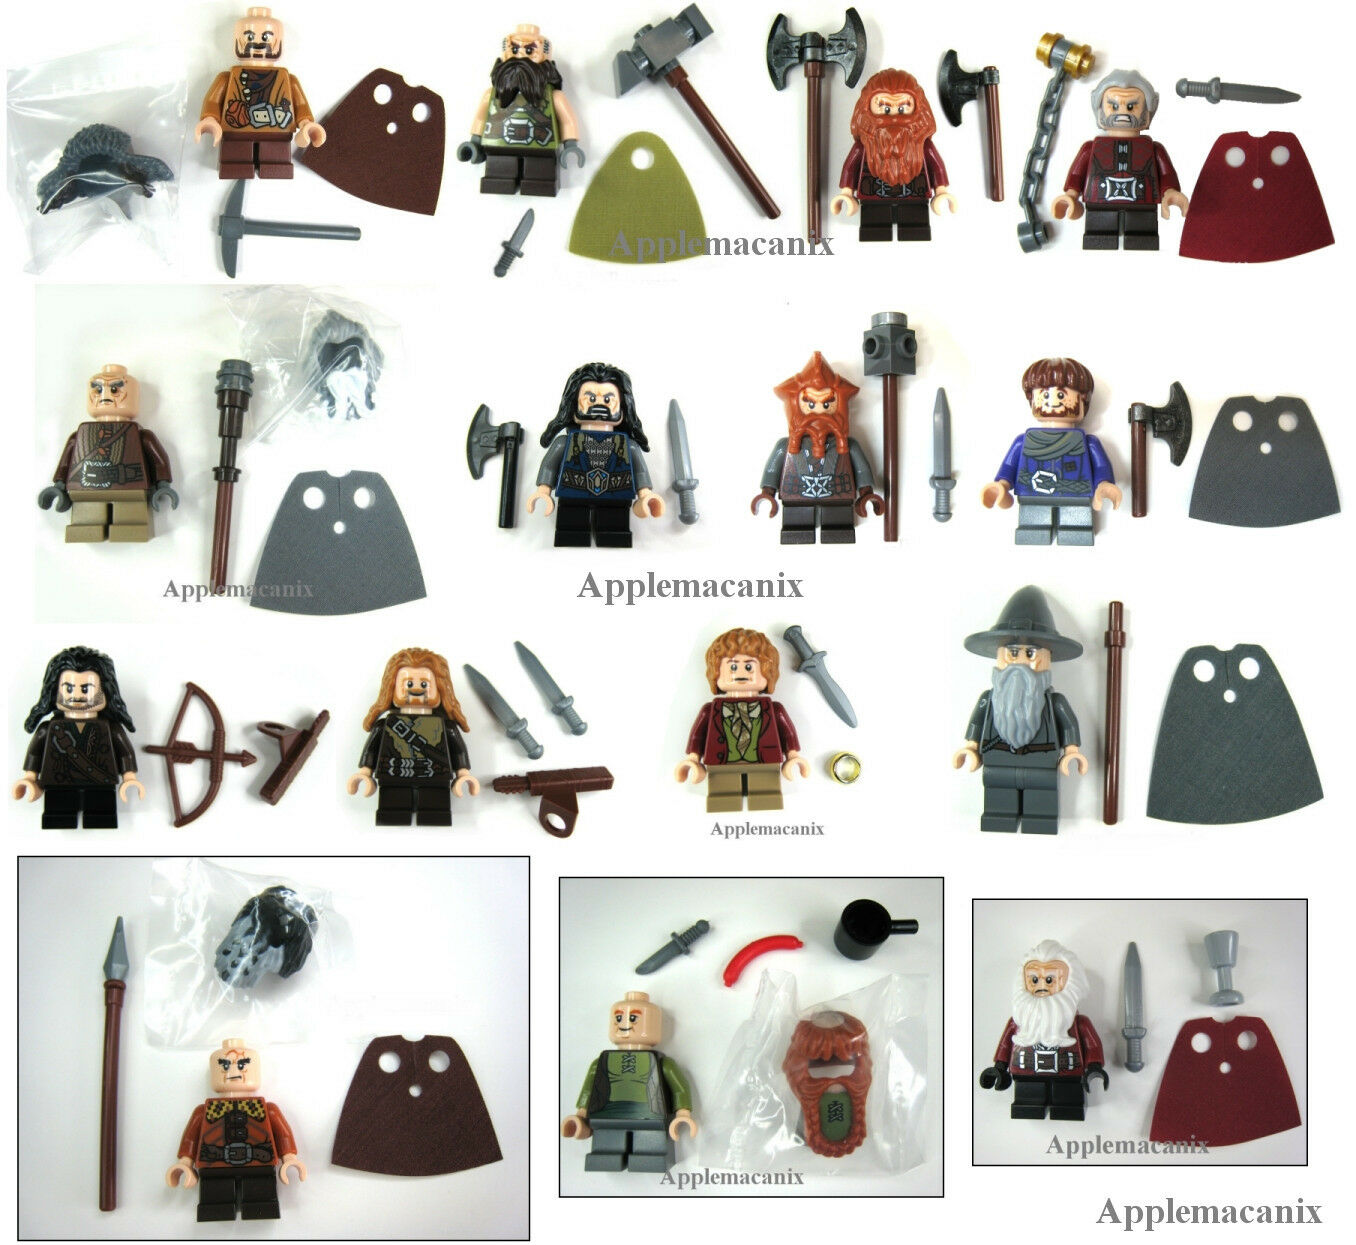 LEGO The Hobbit COMPLETE SET 13 COMPANY OF DWARVES +GANDALF/BILBO Minifigures 15